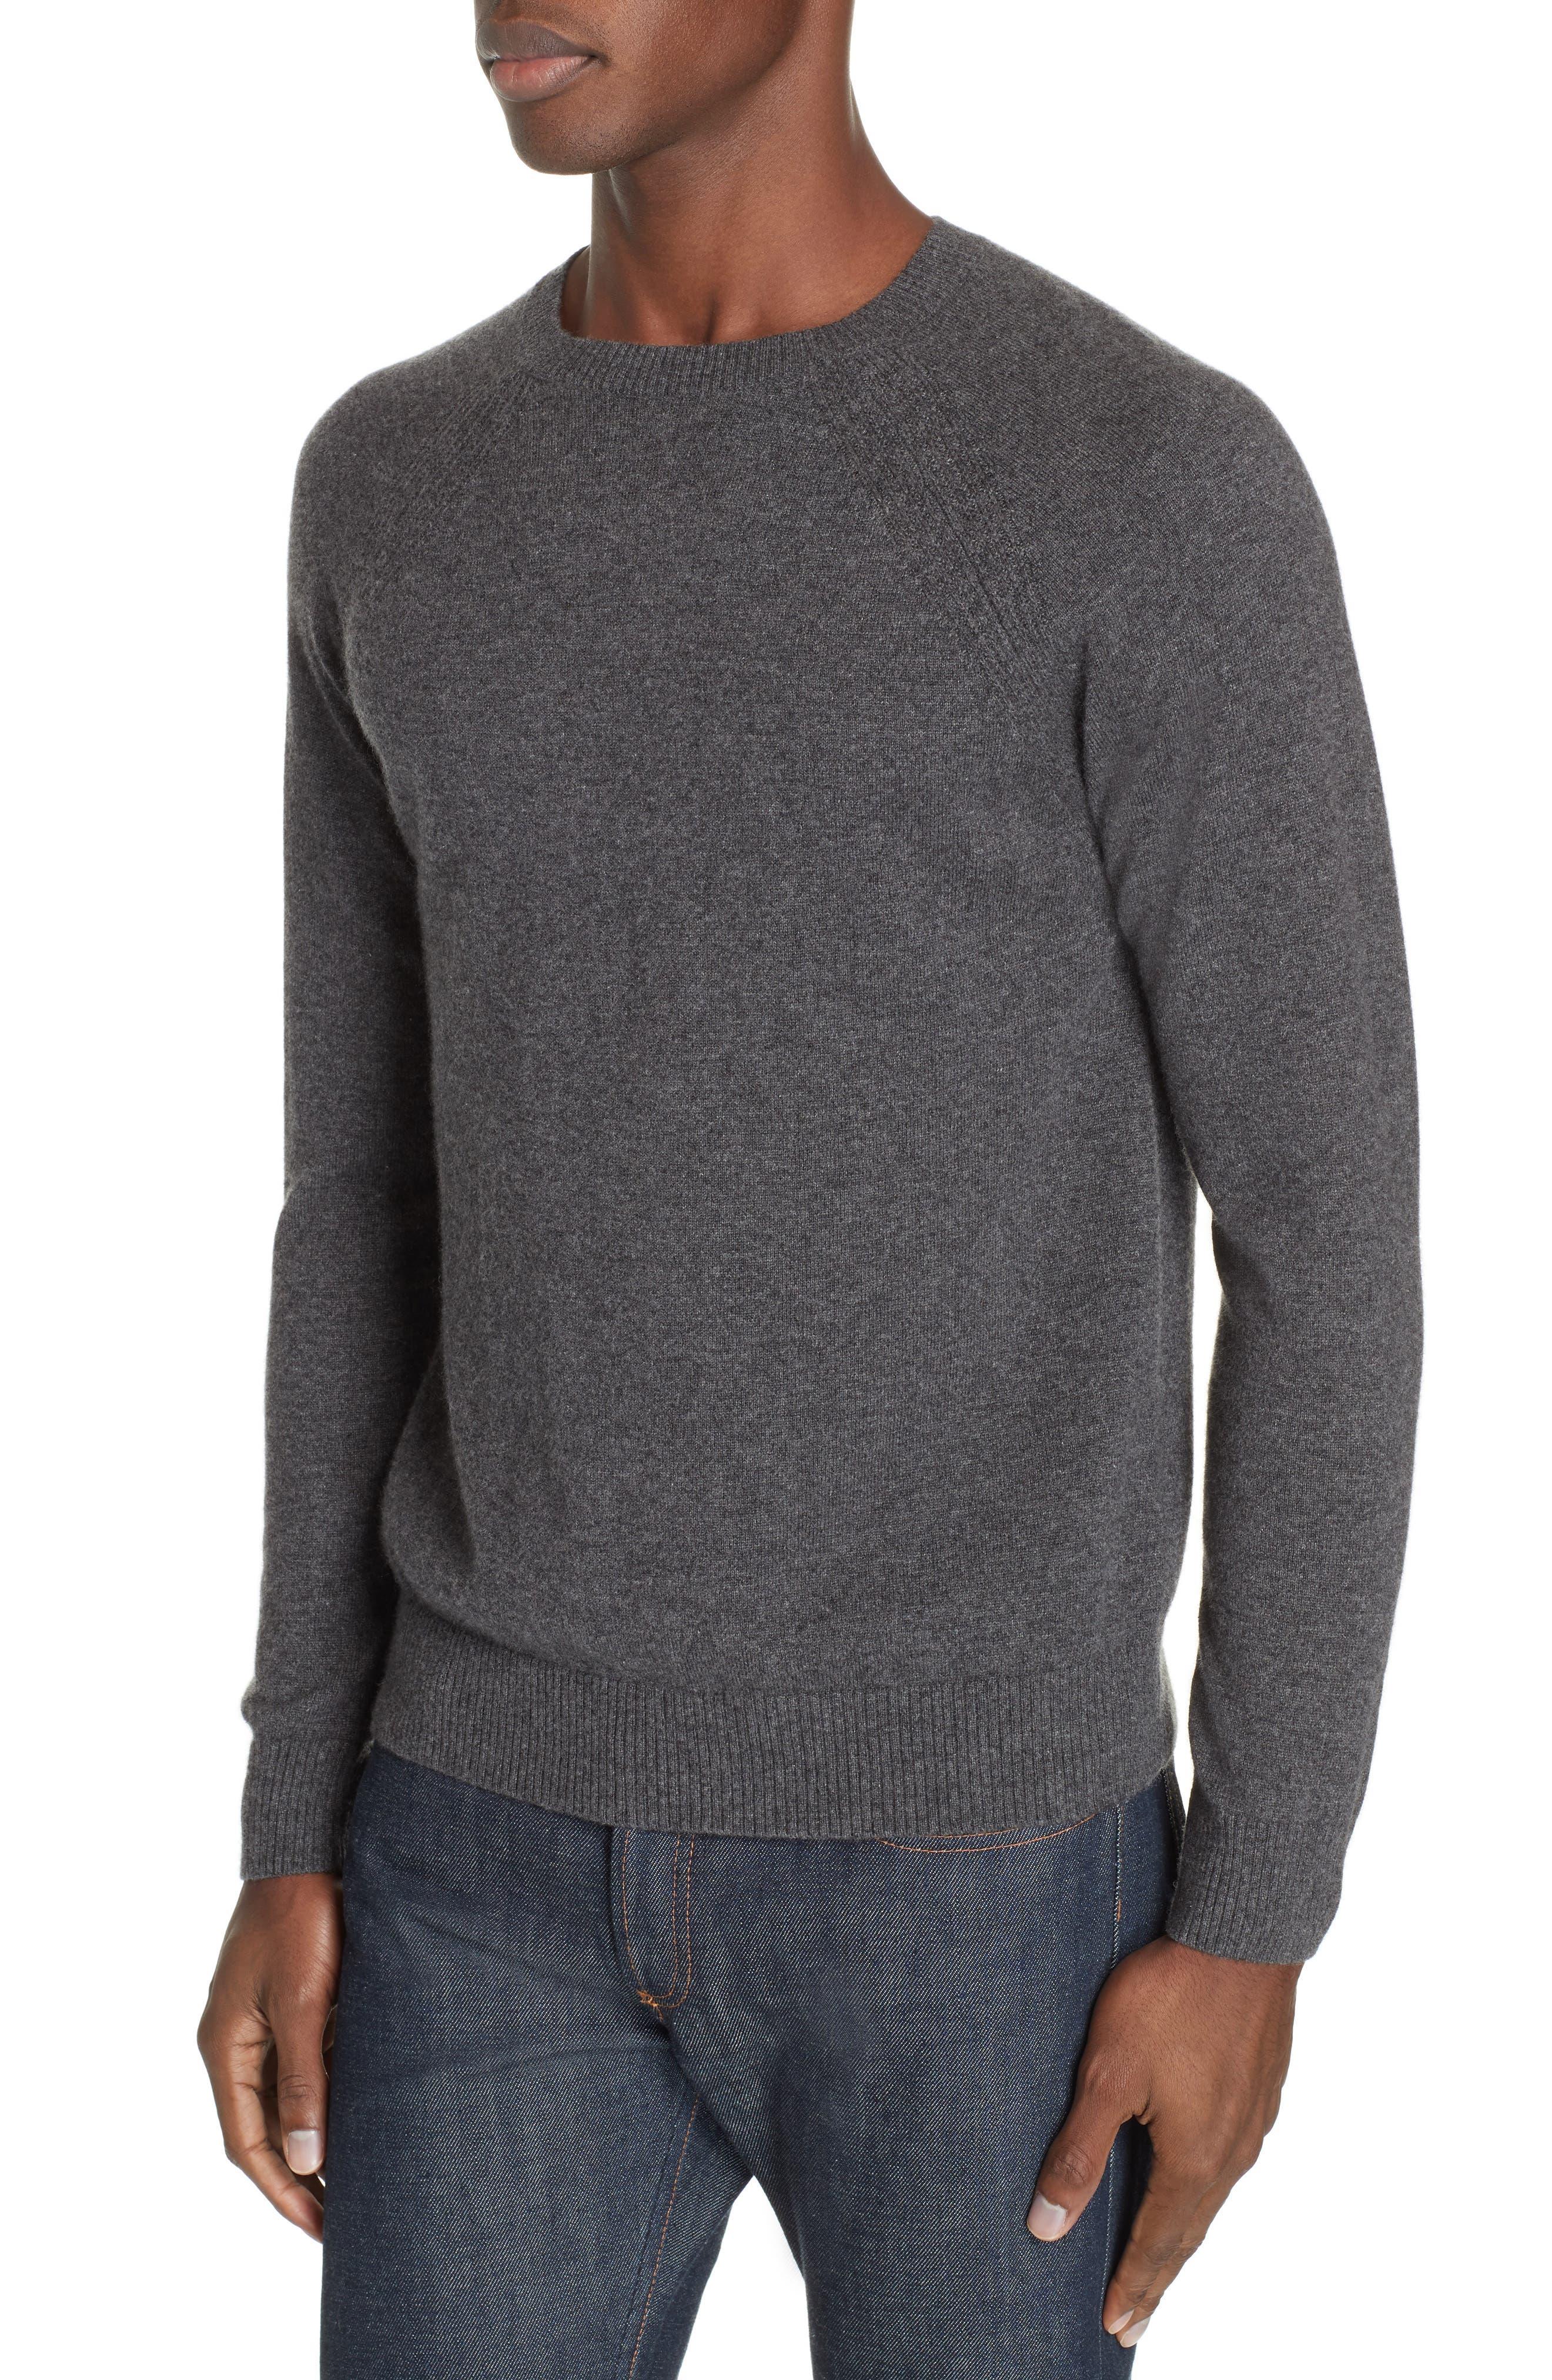 Cashmere Crewneck Sweater,                             Alternate thumbnail 4, color,                             ANTHRACITE